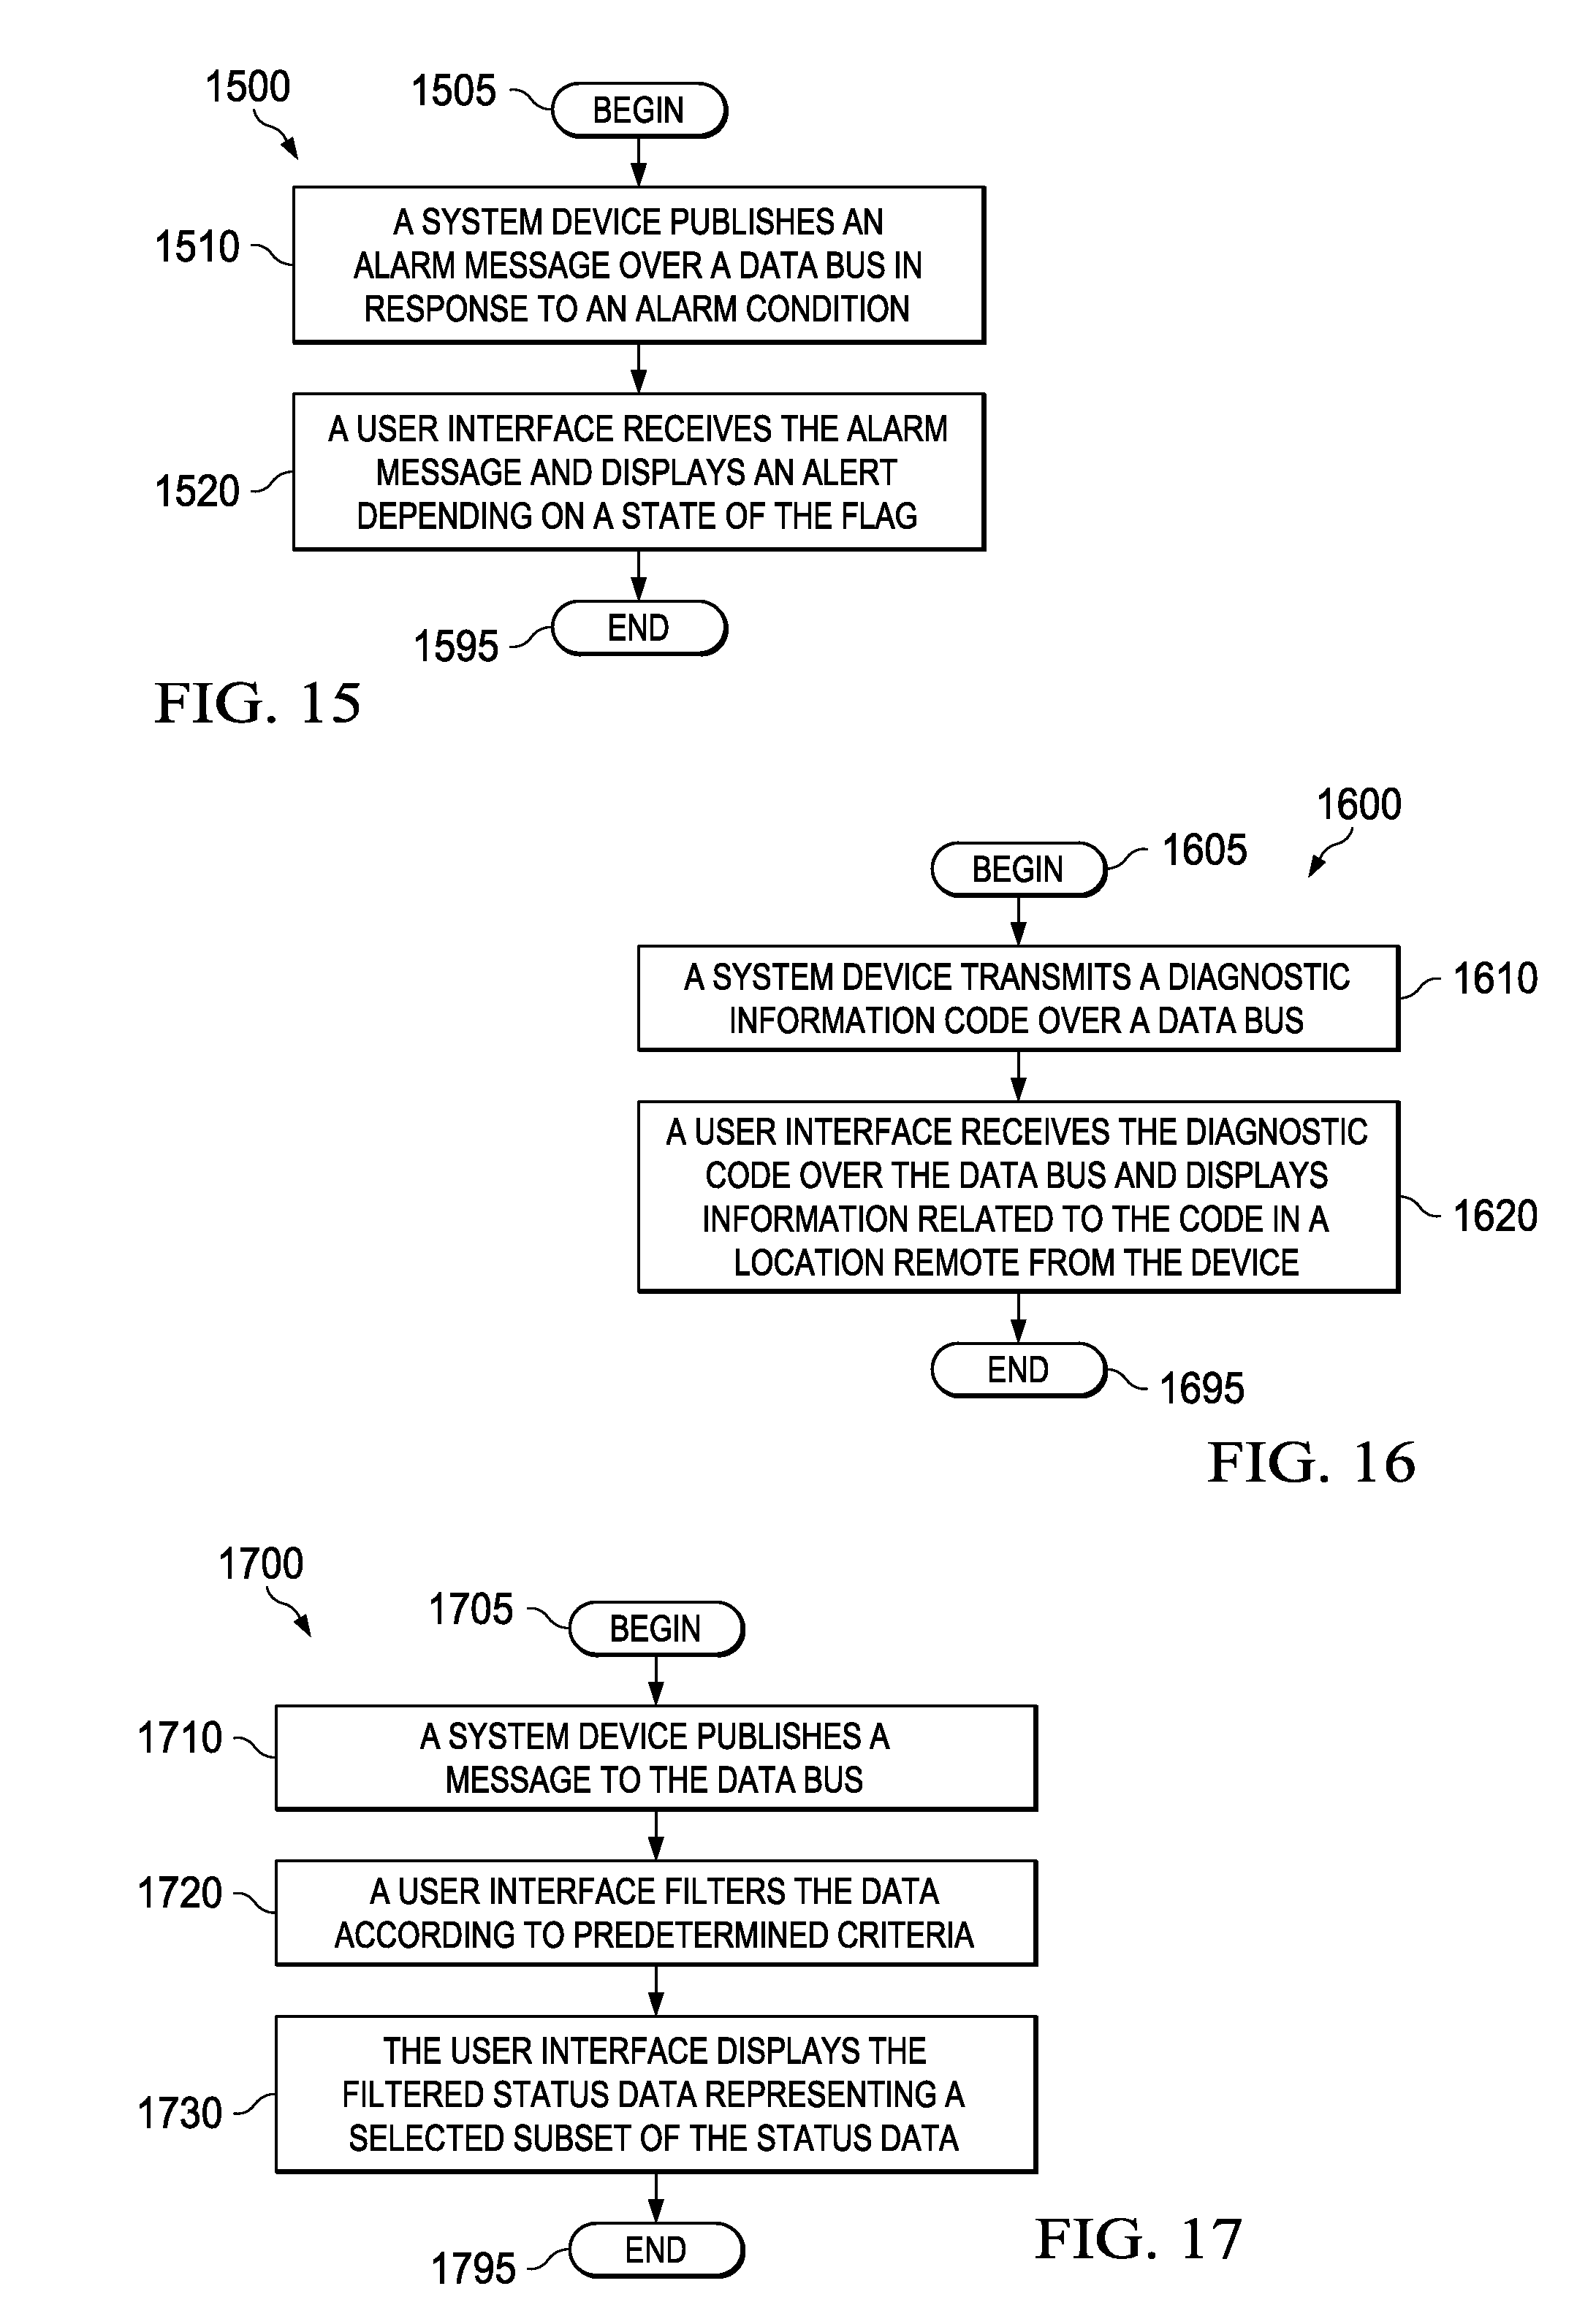 Patent US 8,548,630 B2